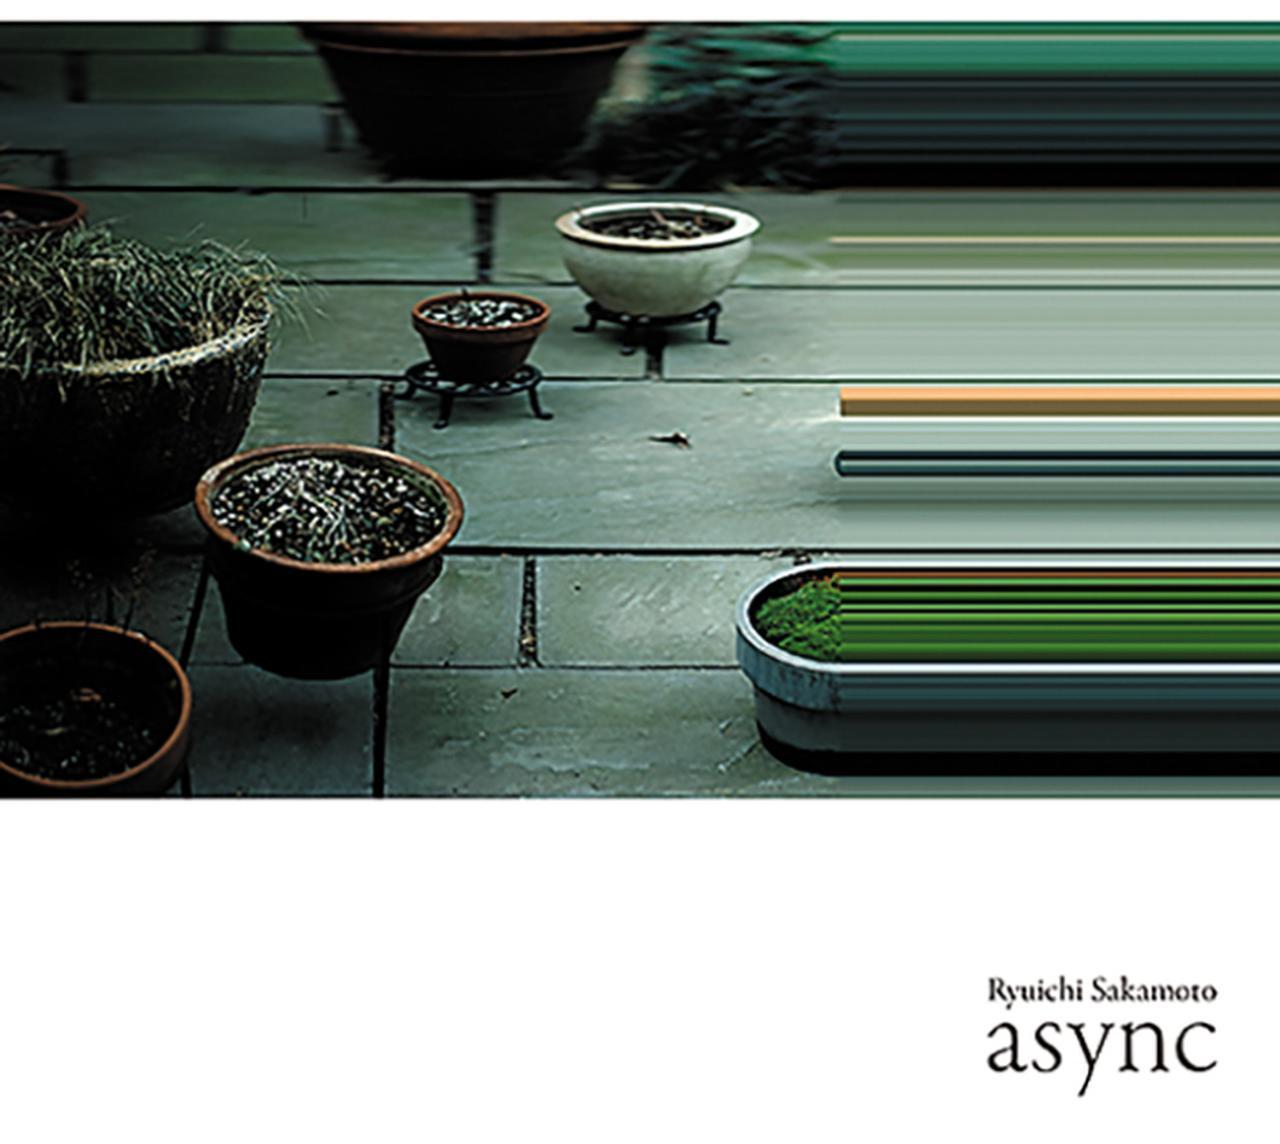 Images : 2番目の画像 - 「福岡伸一が考えた、 坂本龍一と新譜と世界の秩序」のアルバム - T JAPAN:The New York Times Style Magazine 公式サイト